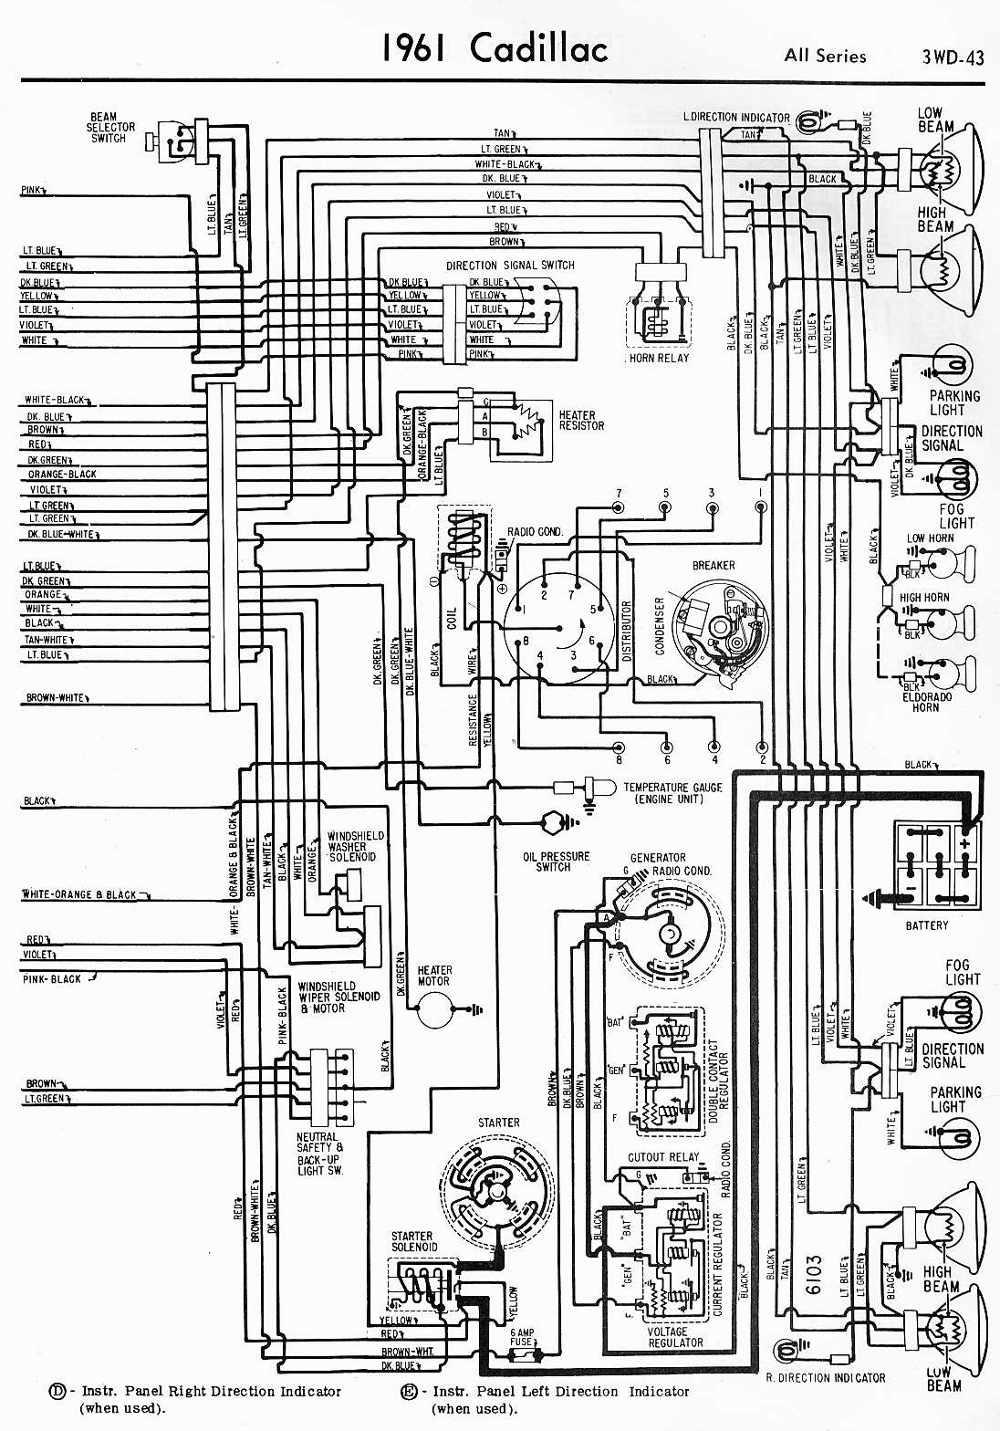 Wiring Diagrams Schematics 1961 Cadillac All Series Part 2